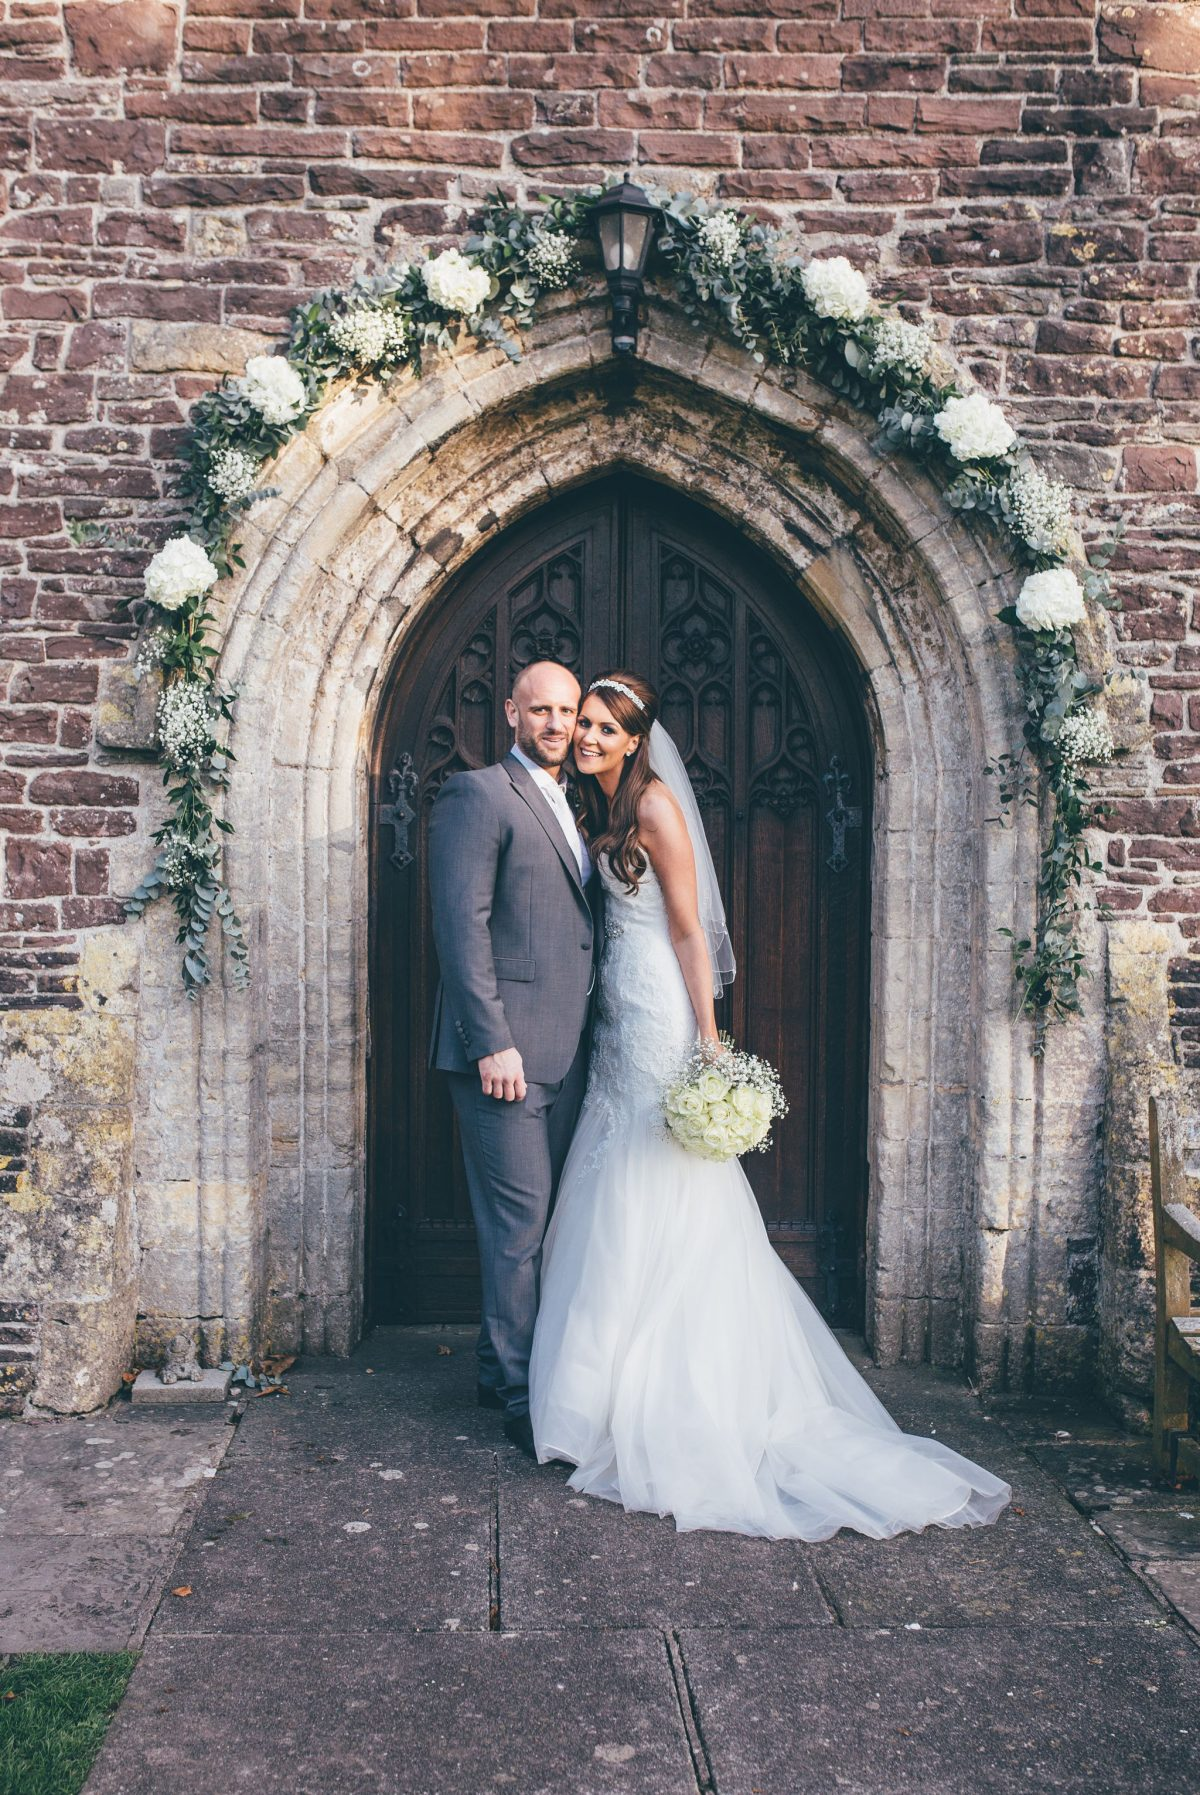 welsh_wedding_photographer_rachel_lambert_photography_decourceys_cardiff_rhiannon_gavin_ 35